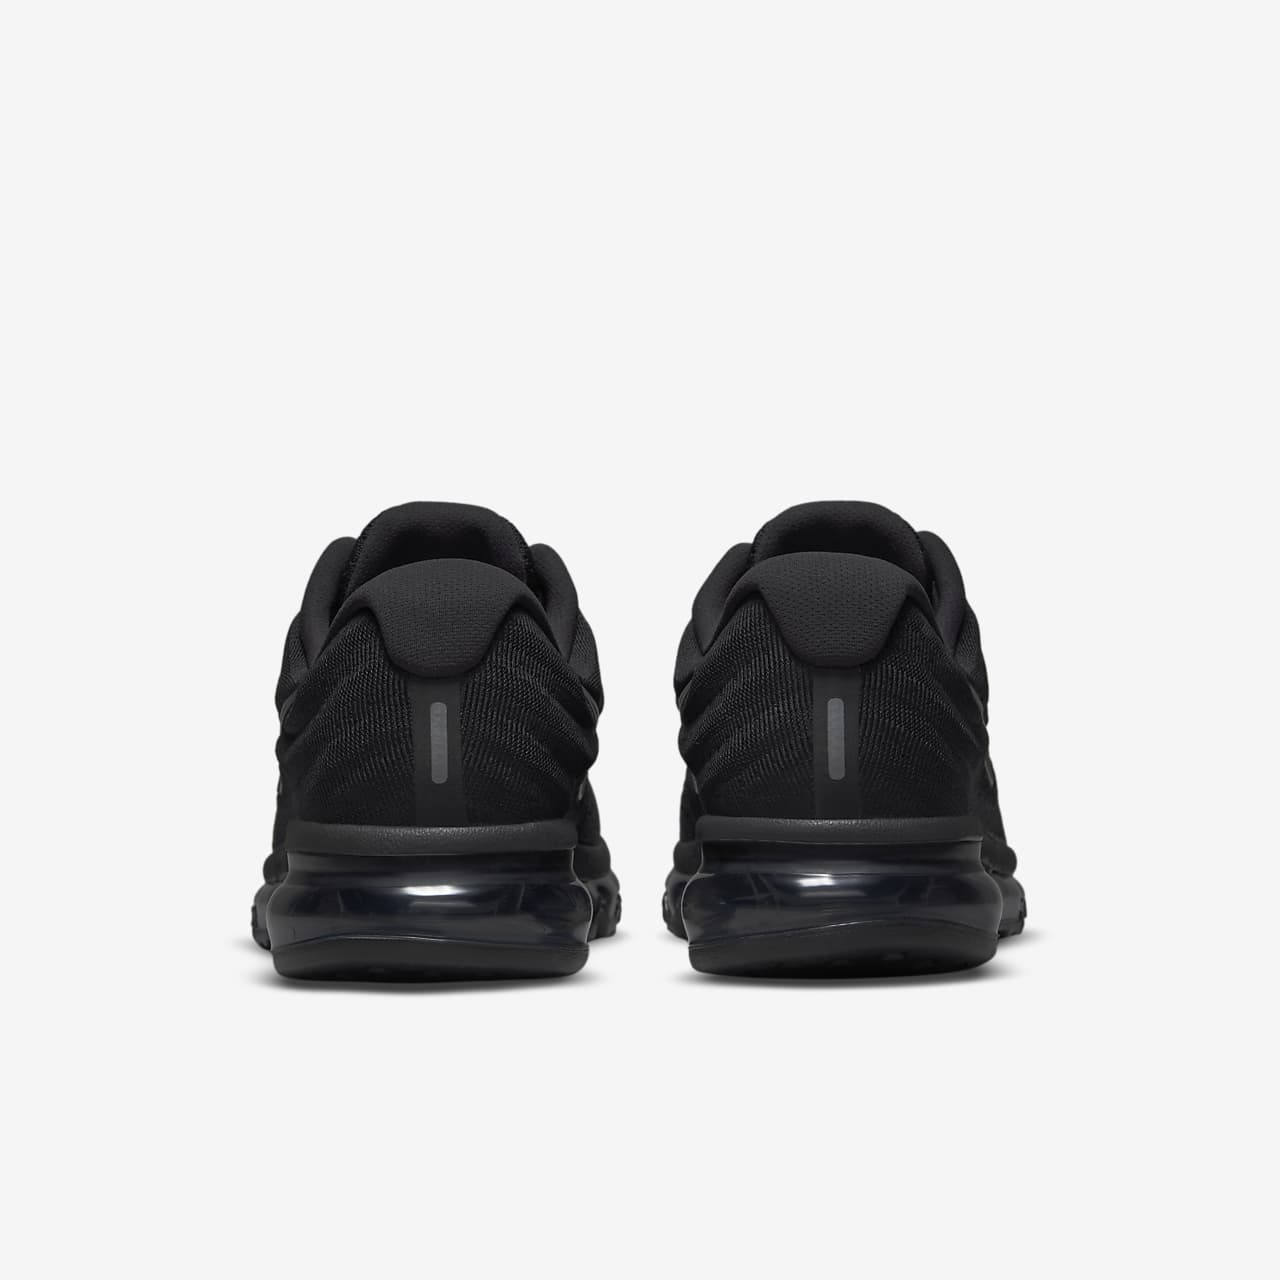 nike 2017 air max black